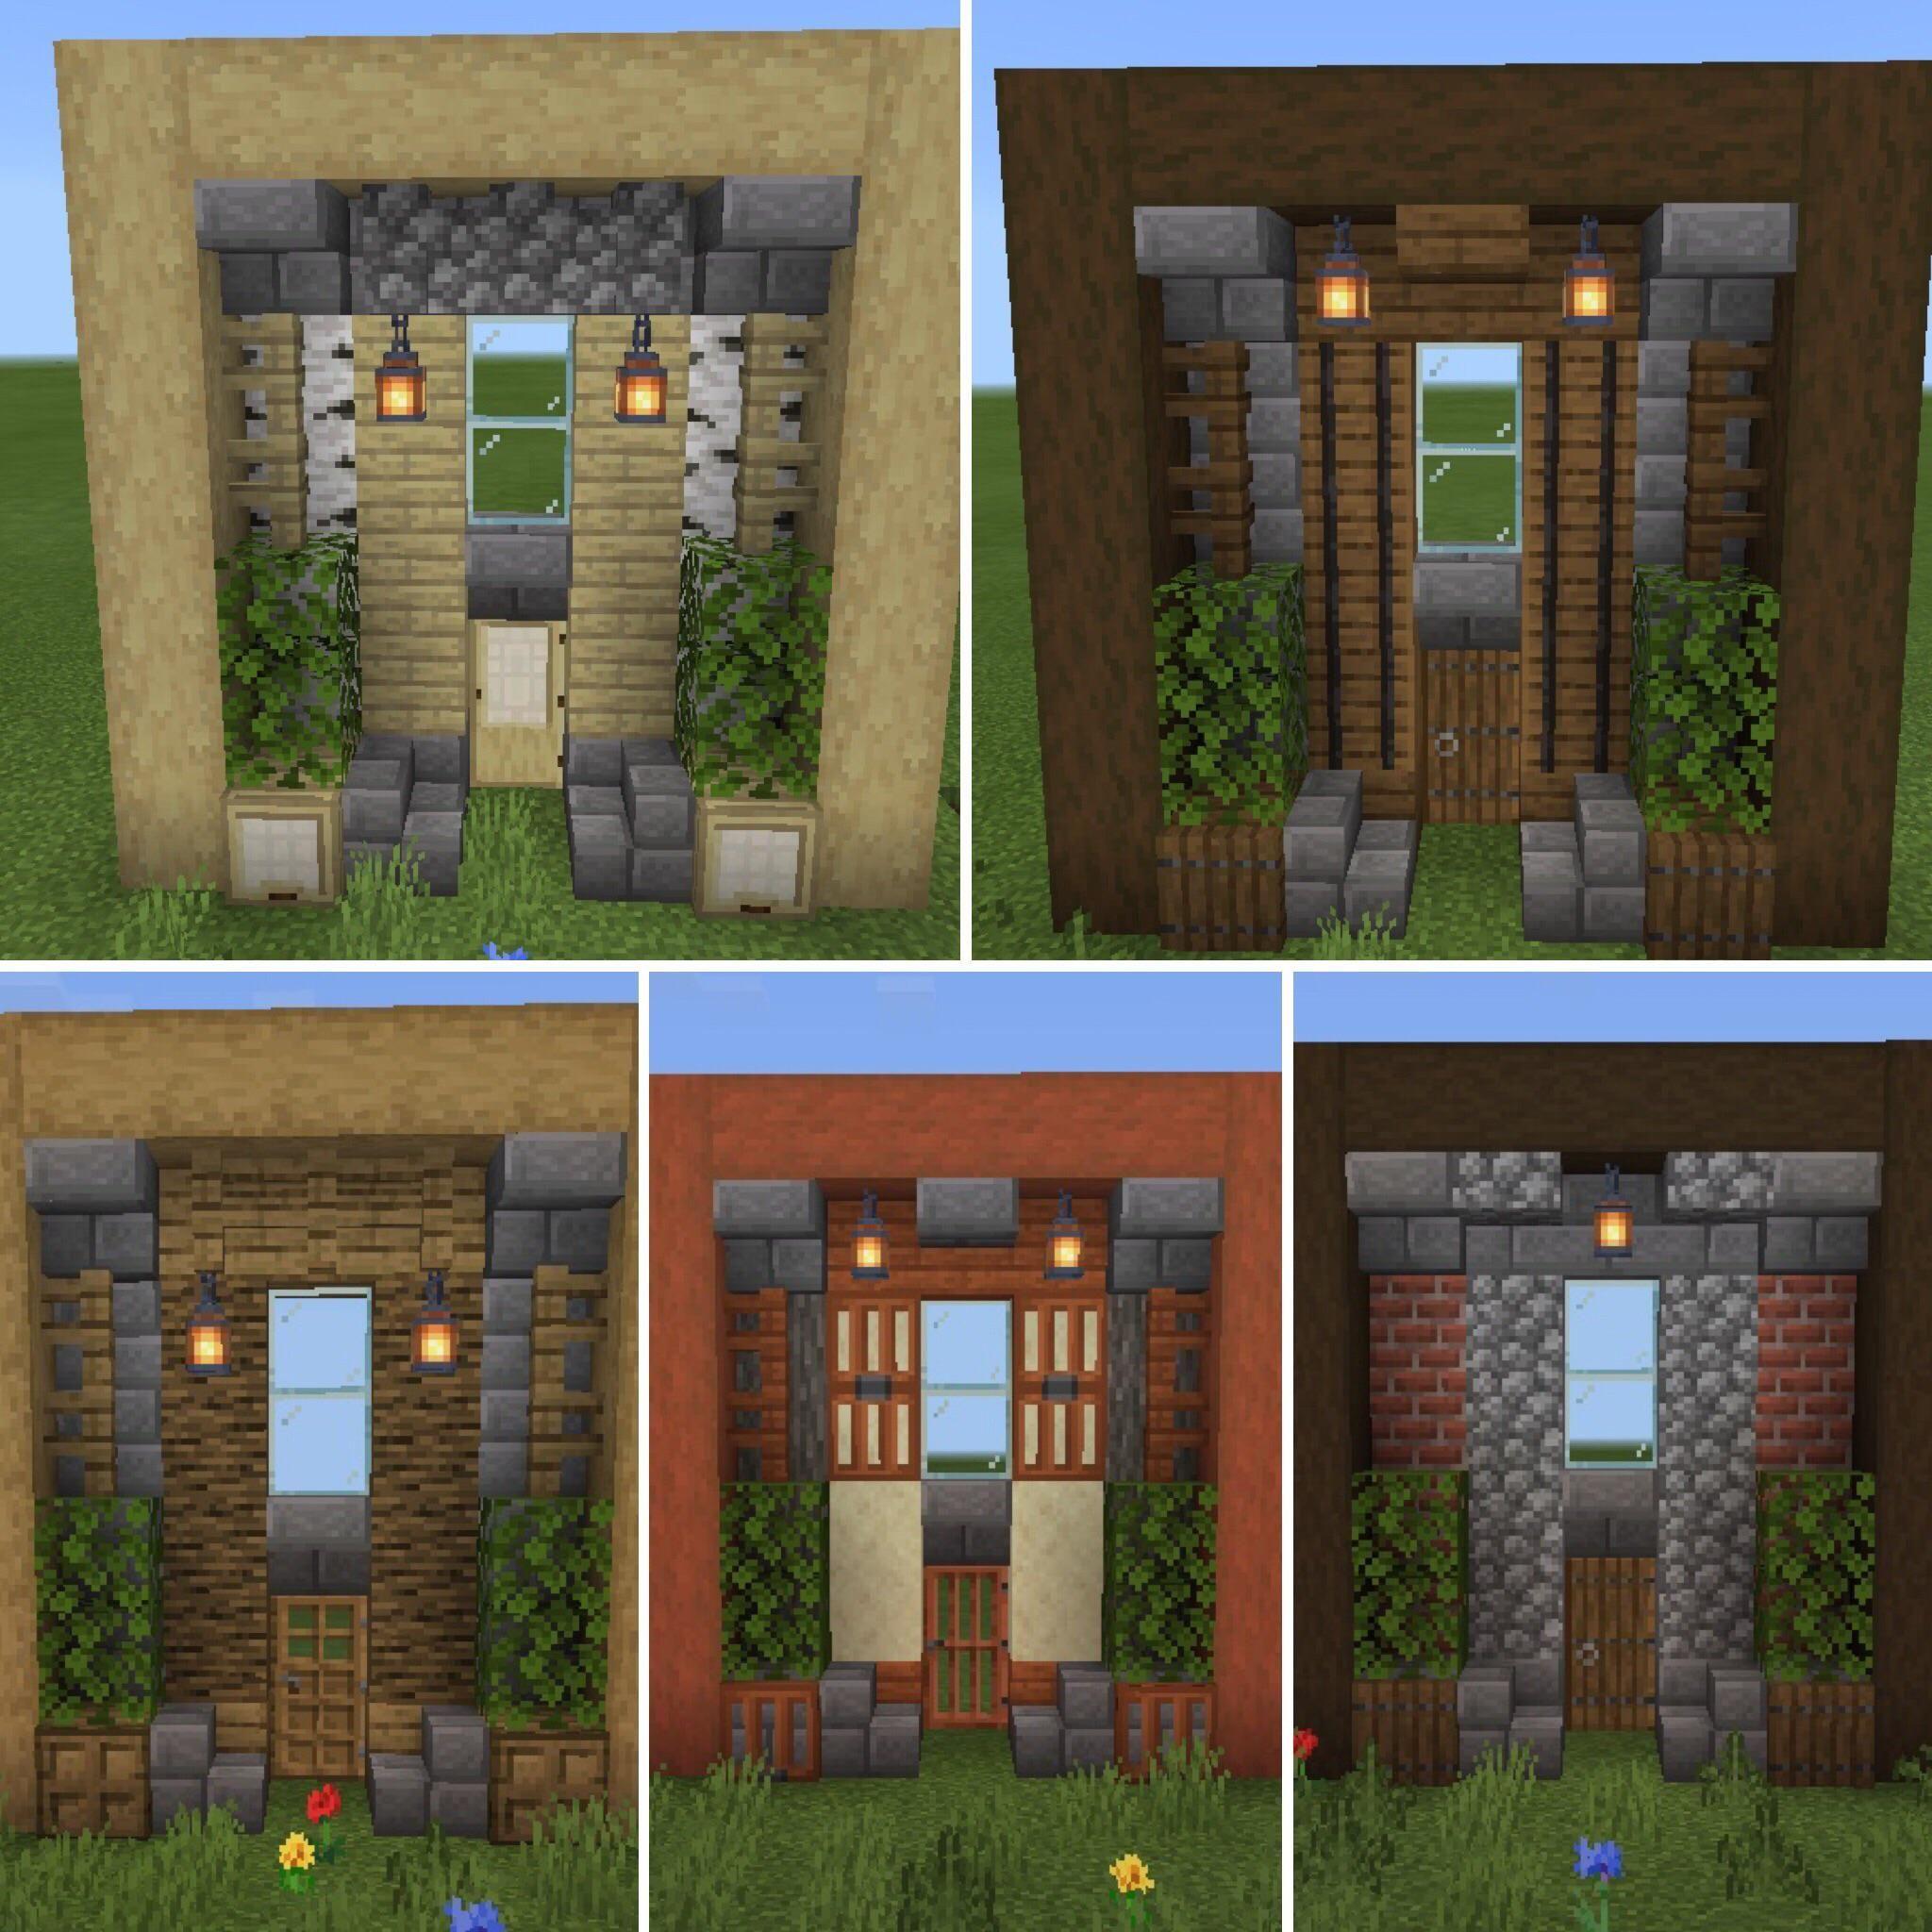 Minecraft House Ideas Blueprints How To Build In 2020 Minecraft Houses Blueprints Minecraft Houses Minecraft Houses Survival